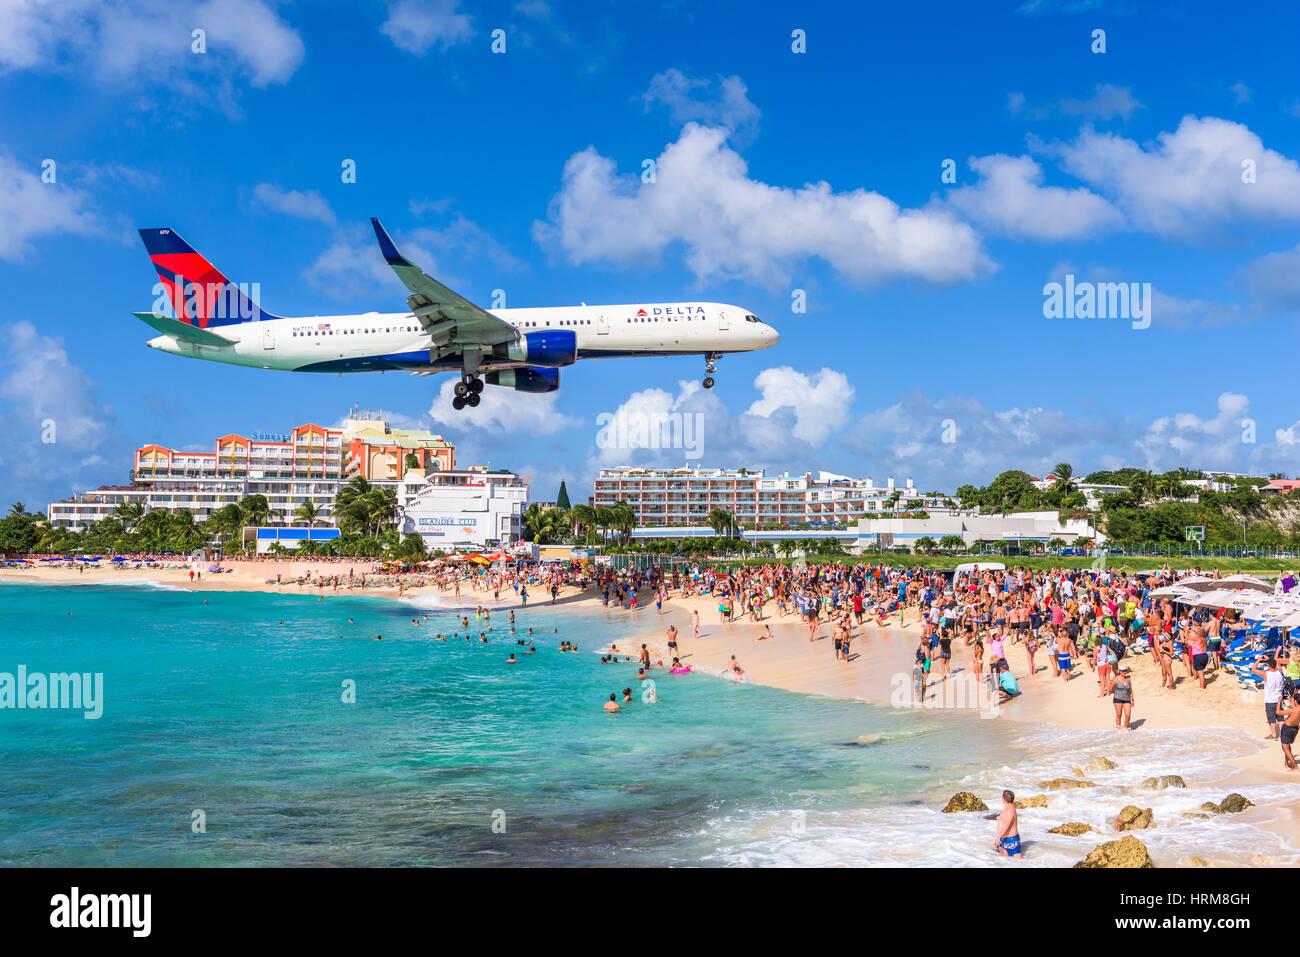 PHILIPSBURG, Sint Maarten - 28 dicembre 2016: un aereo commerciale si avvicina Princess Juliana airport onlooking Immagini Stock